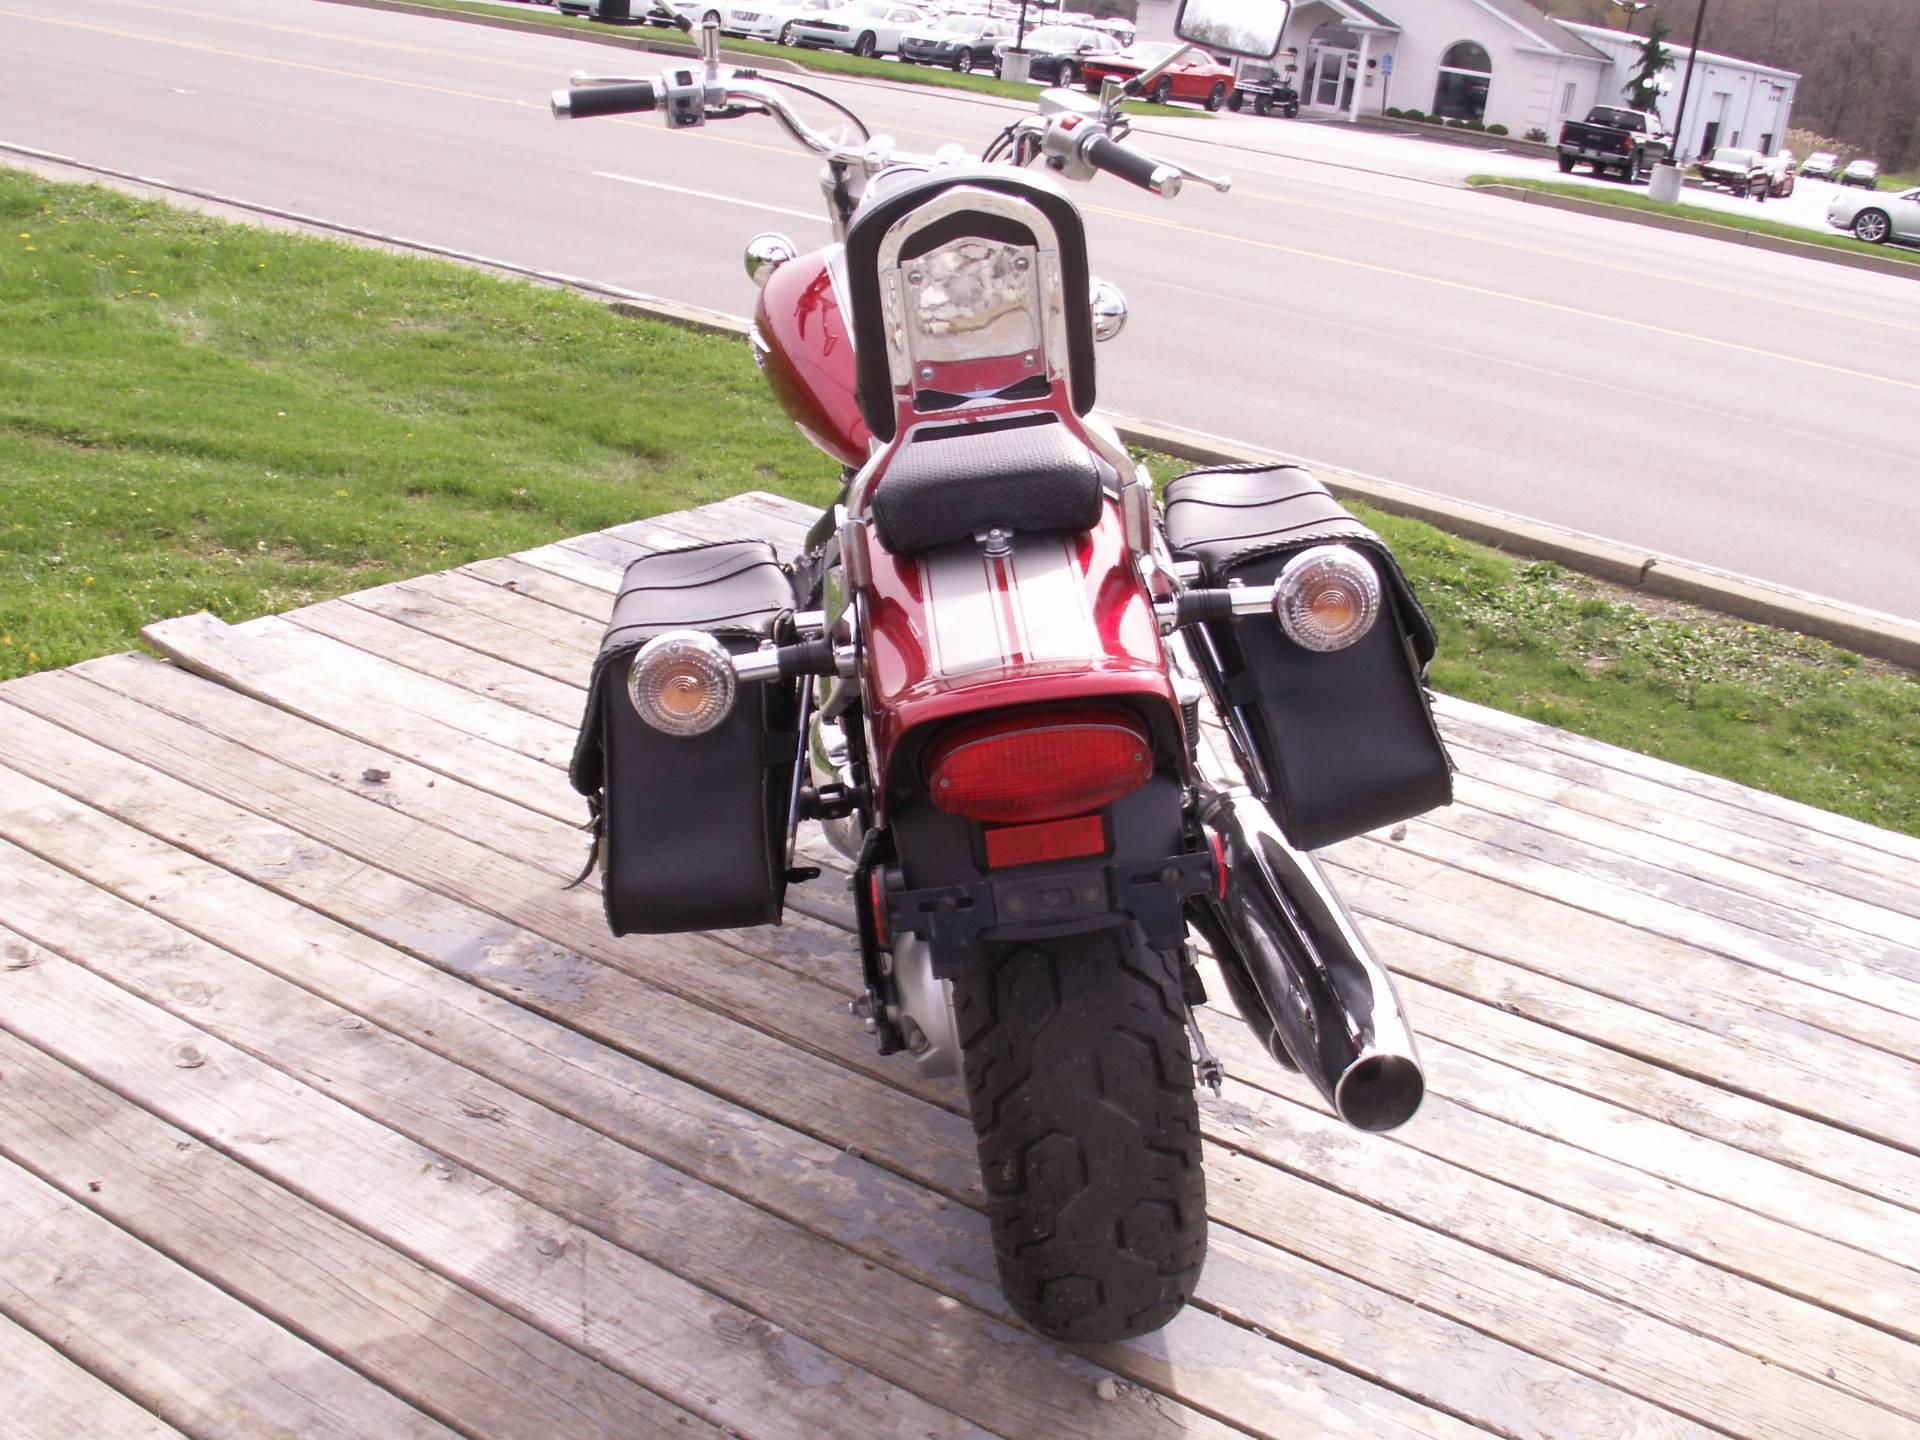 2007 Yamaha V Star® Custom in Hermitage, Pennsylvania